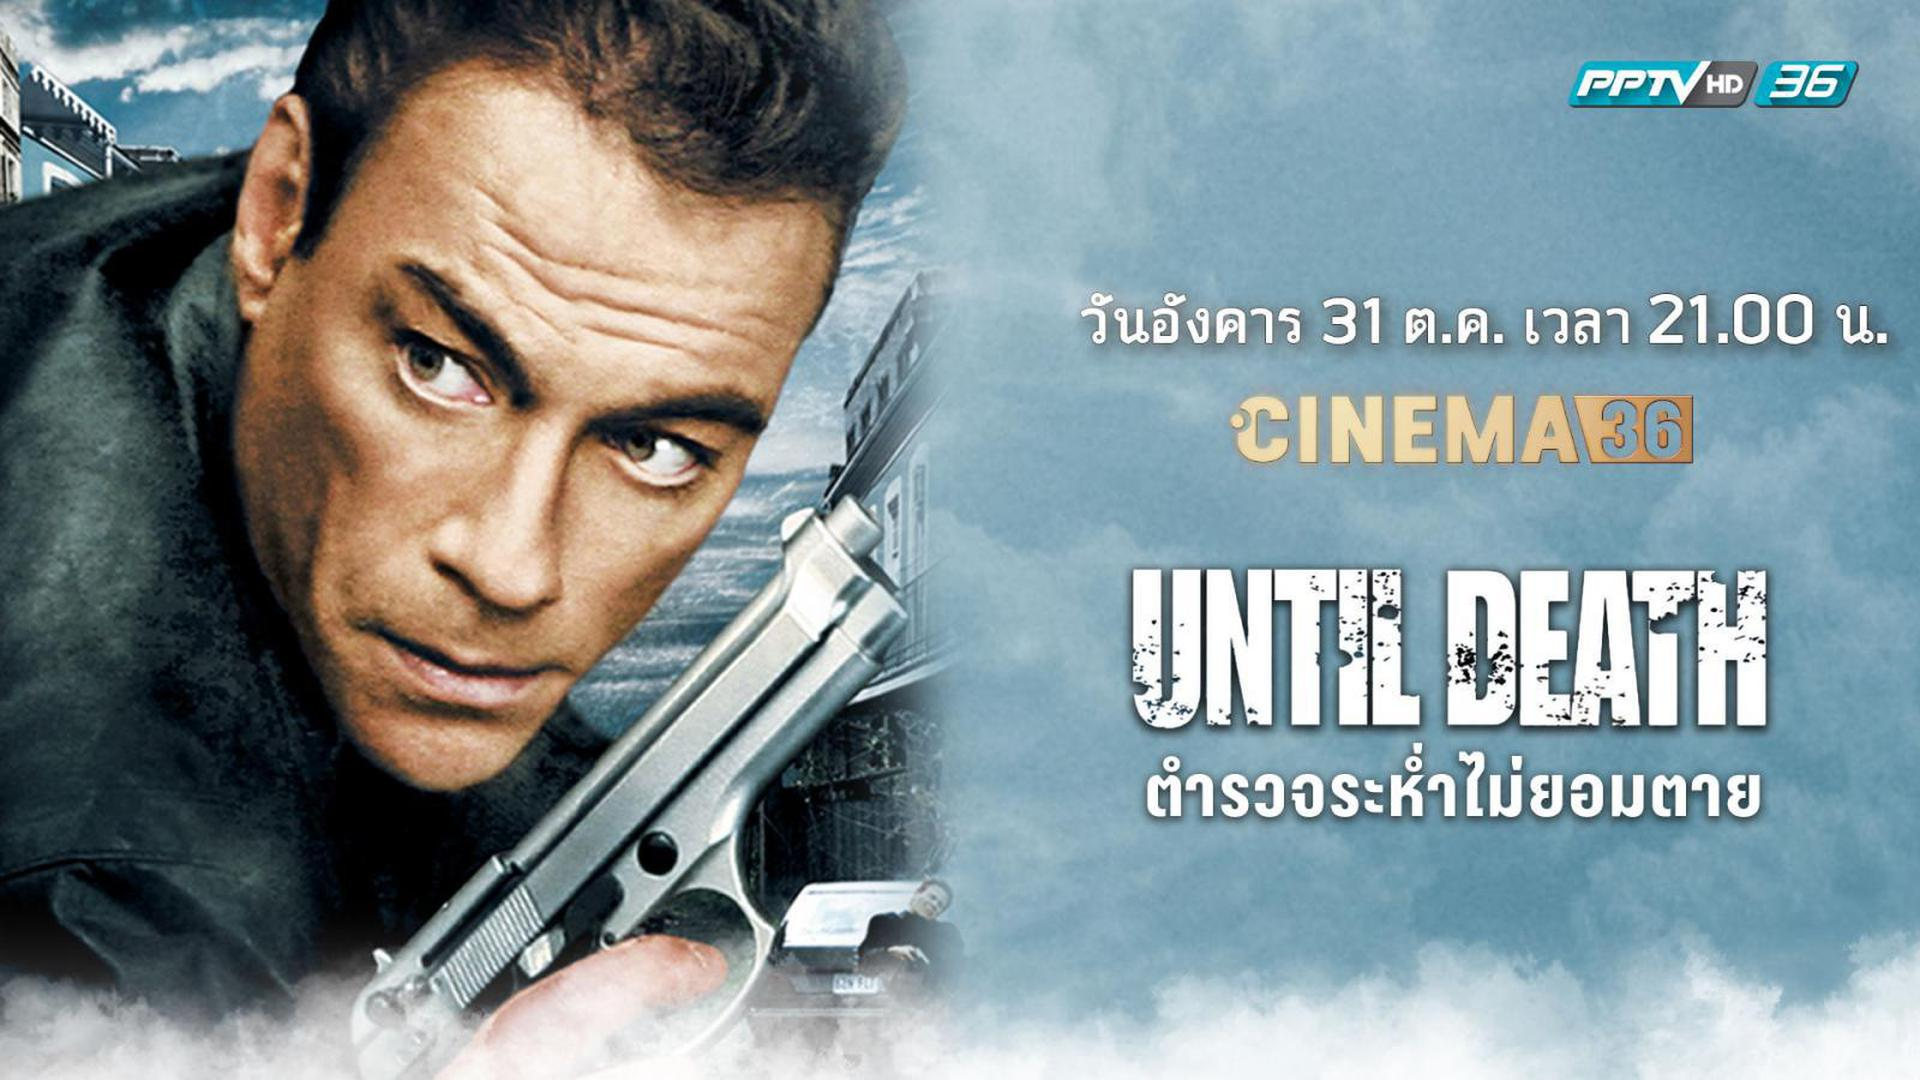 UNTIL DEATH (2007) ตำรวจระห่ำไม่ยอมตาย